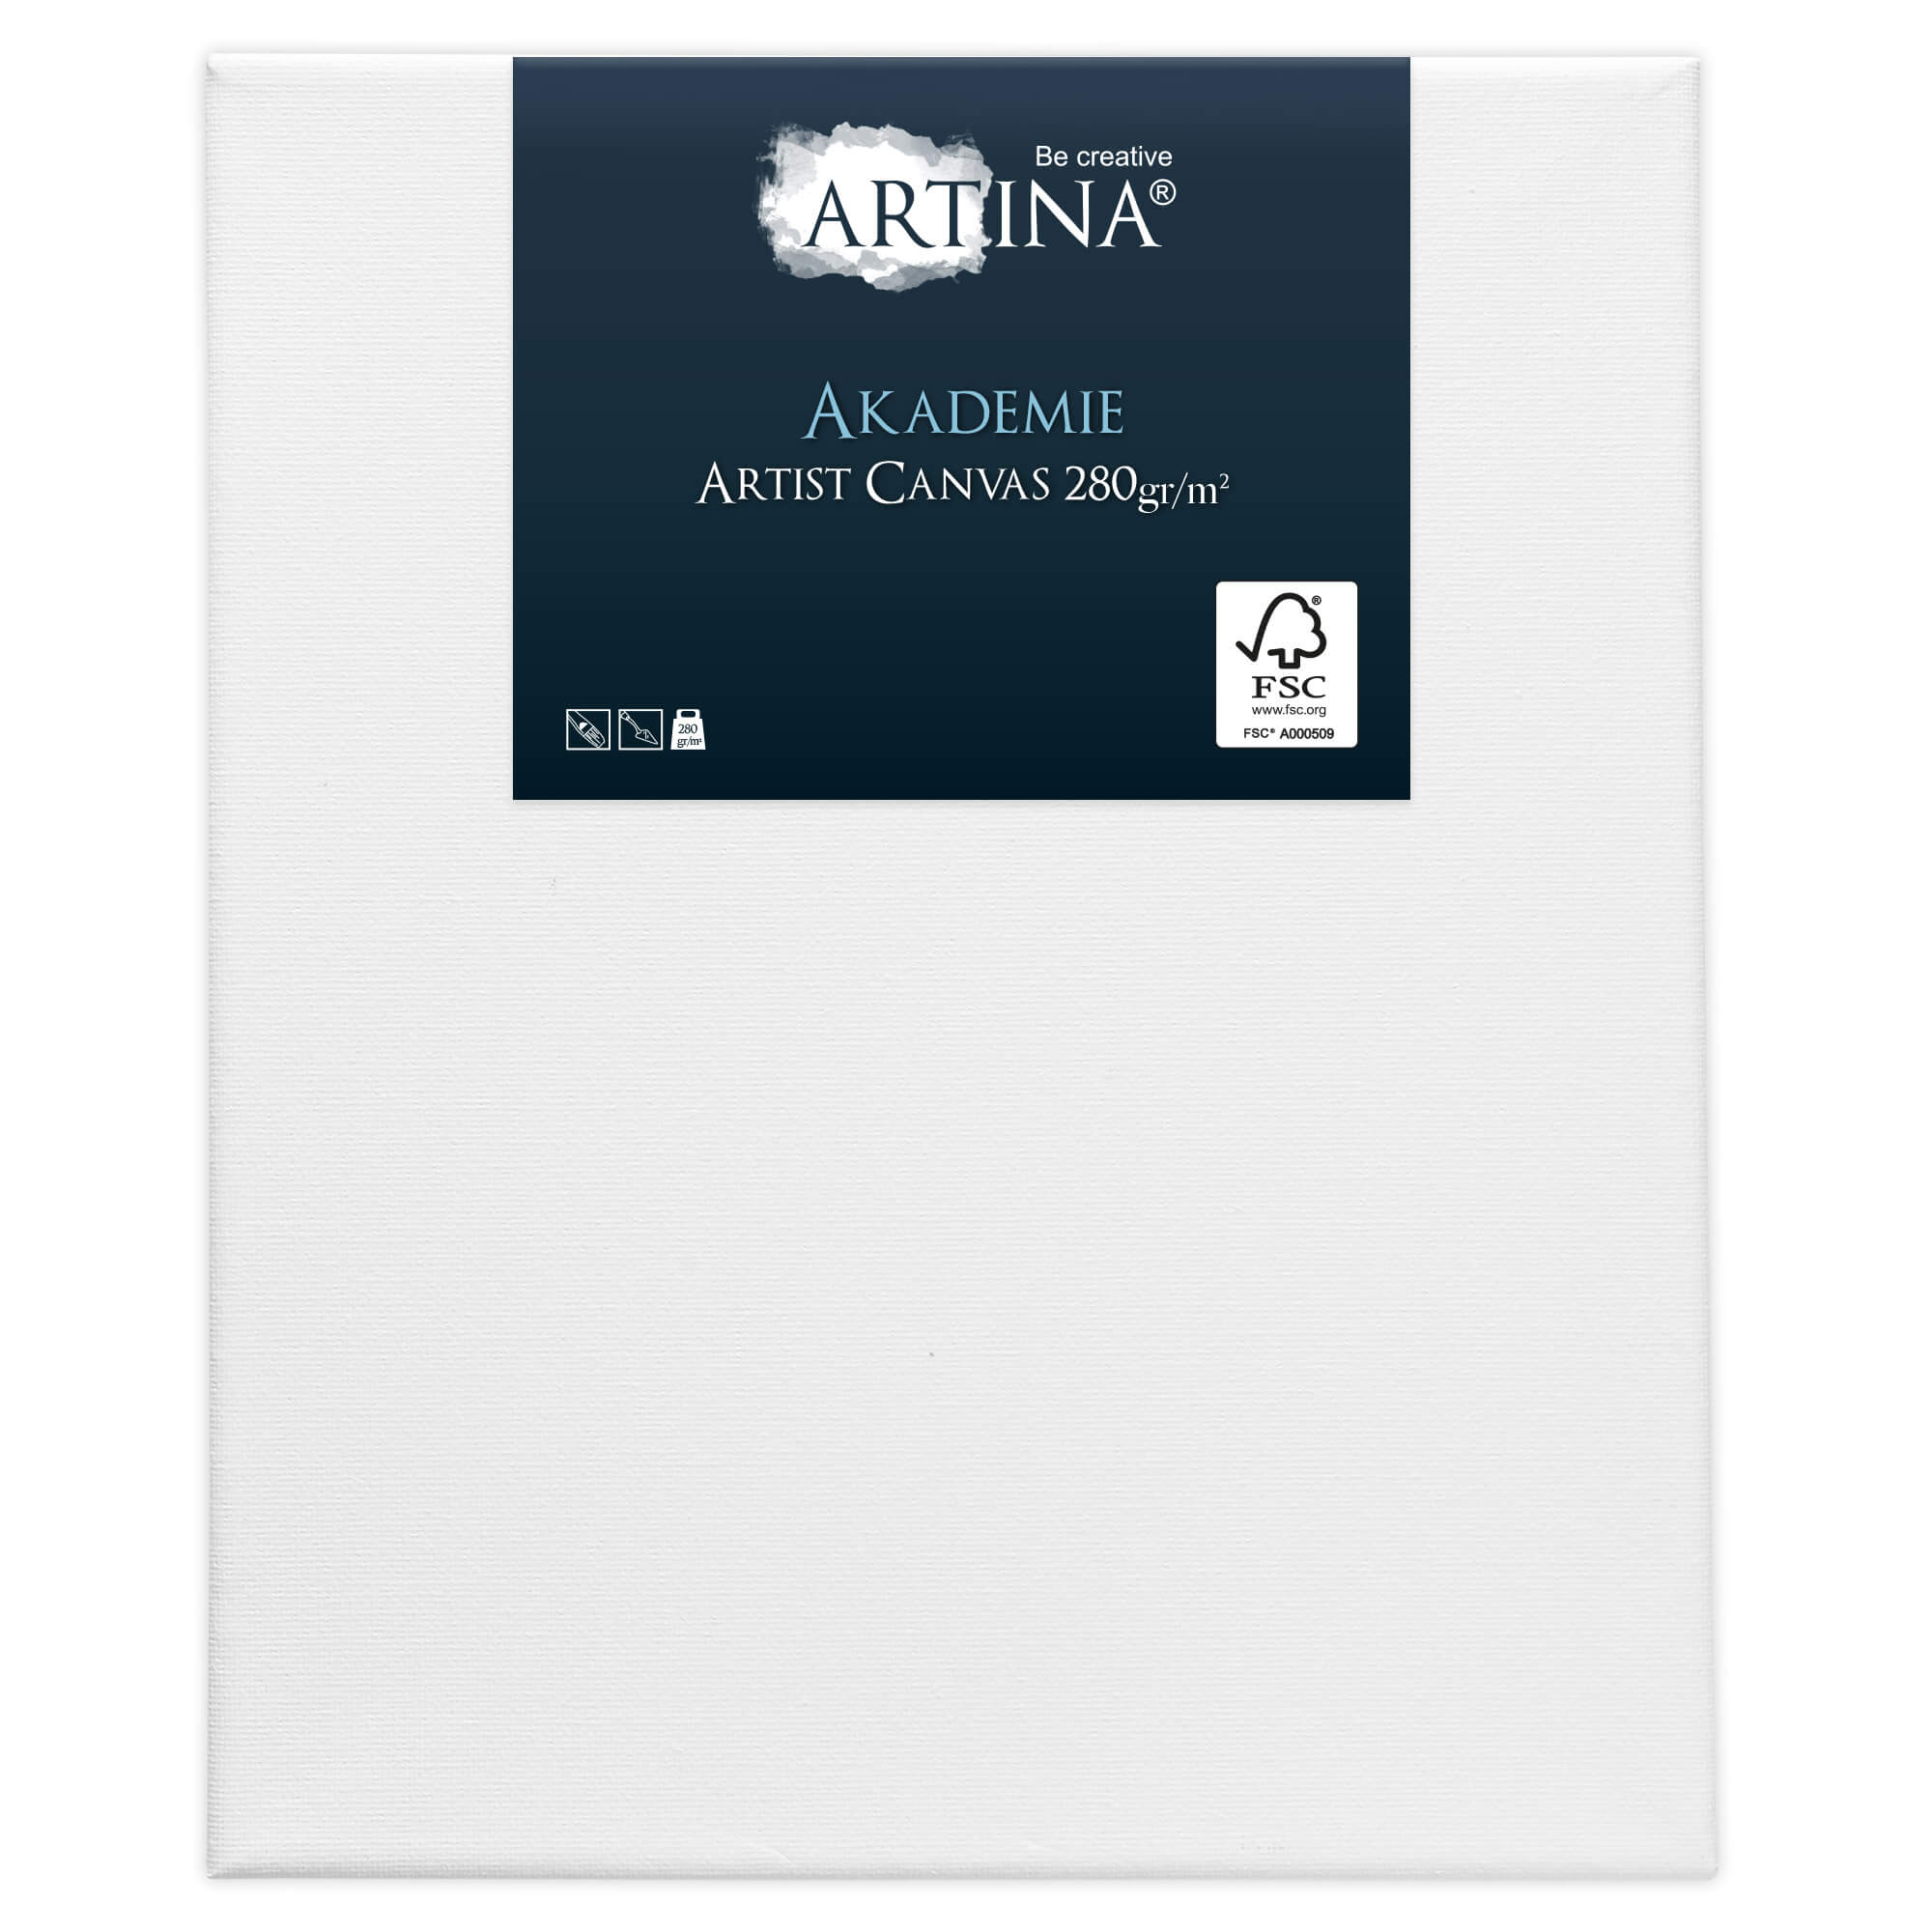 Artina Akademie Leinwand auf Keilrahmen 280g/m² - 30x40cm